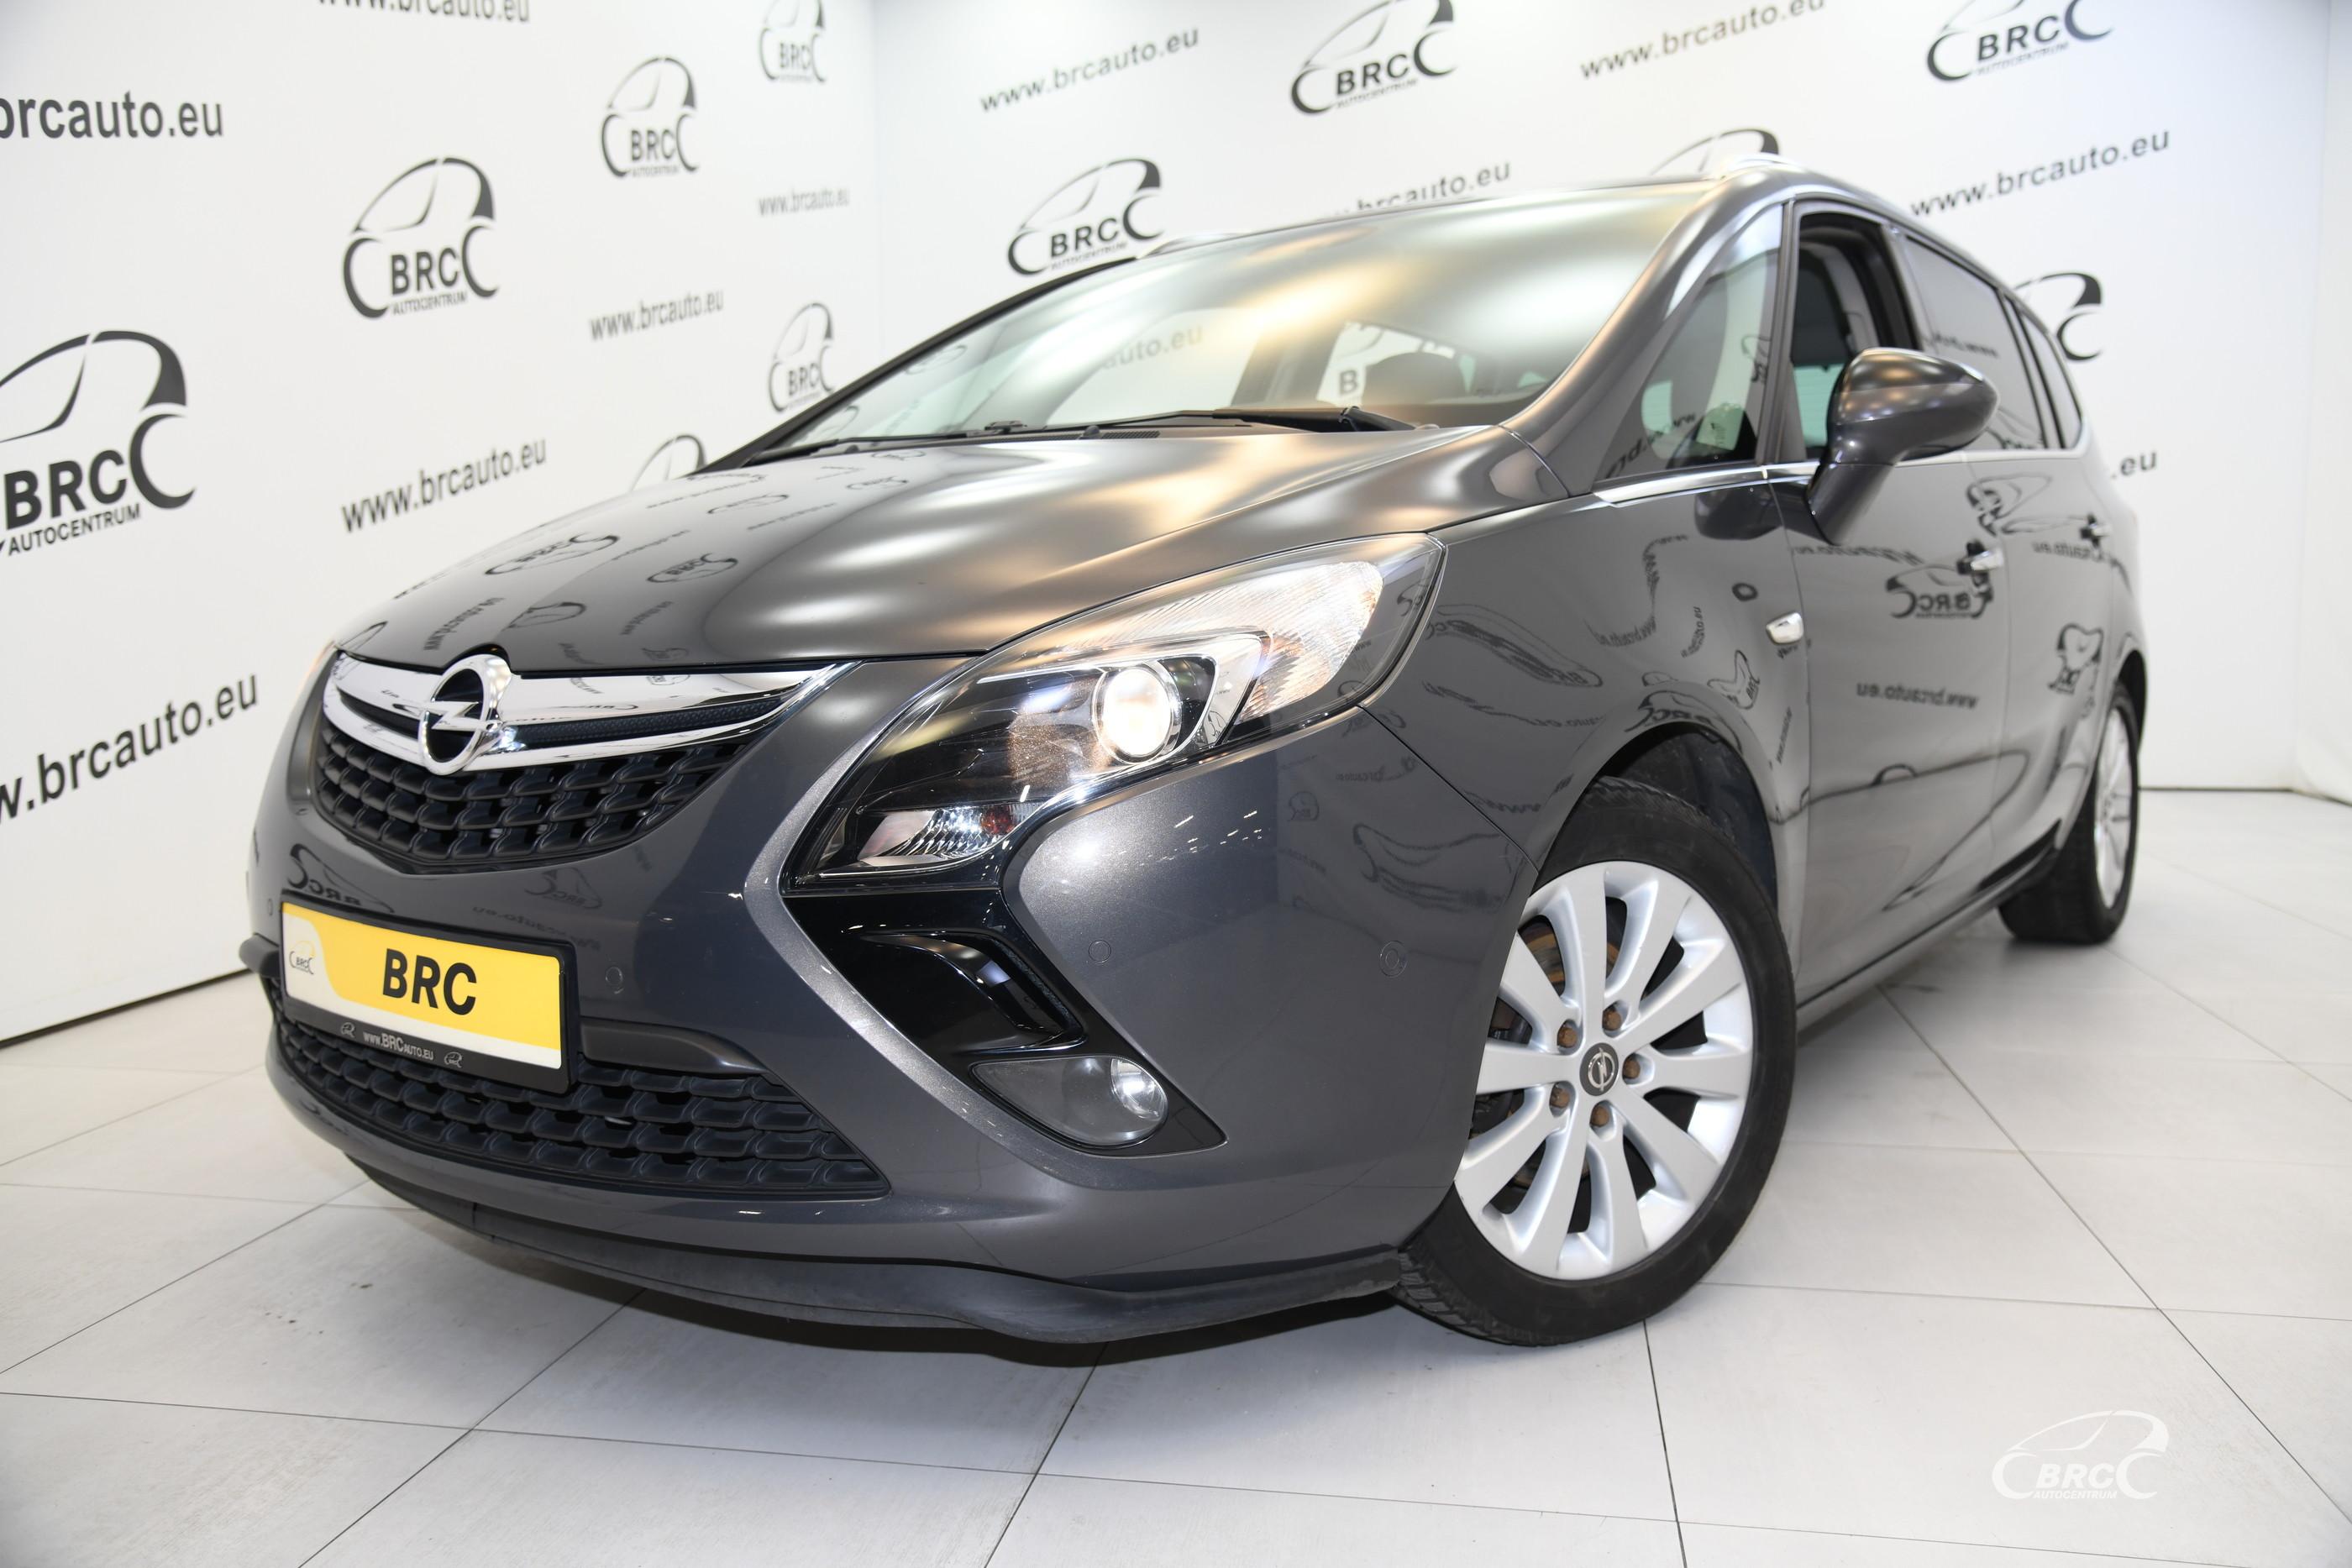 Opel Zafira 1.6 CDTi EcoFLex Tourer